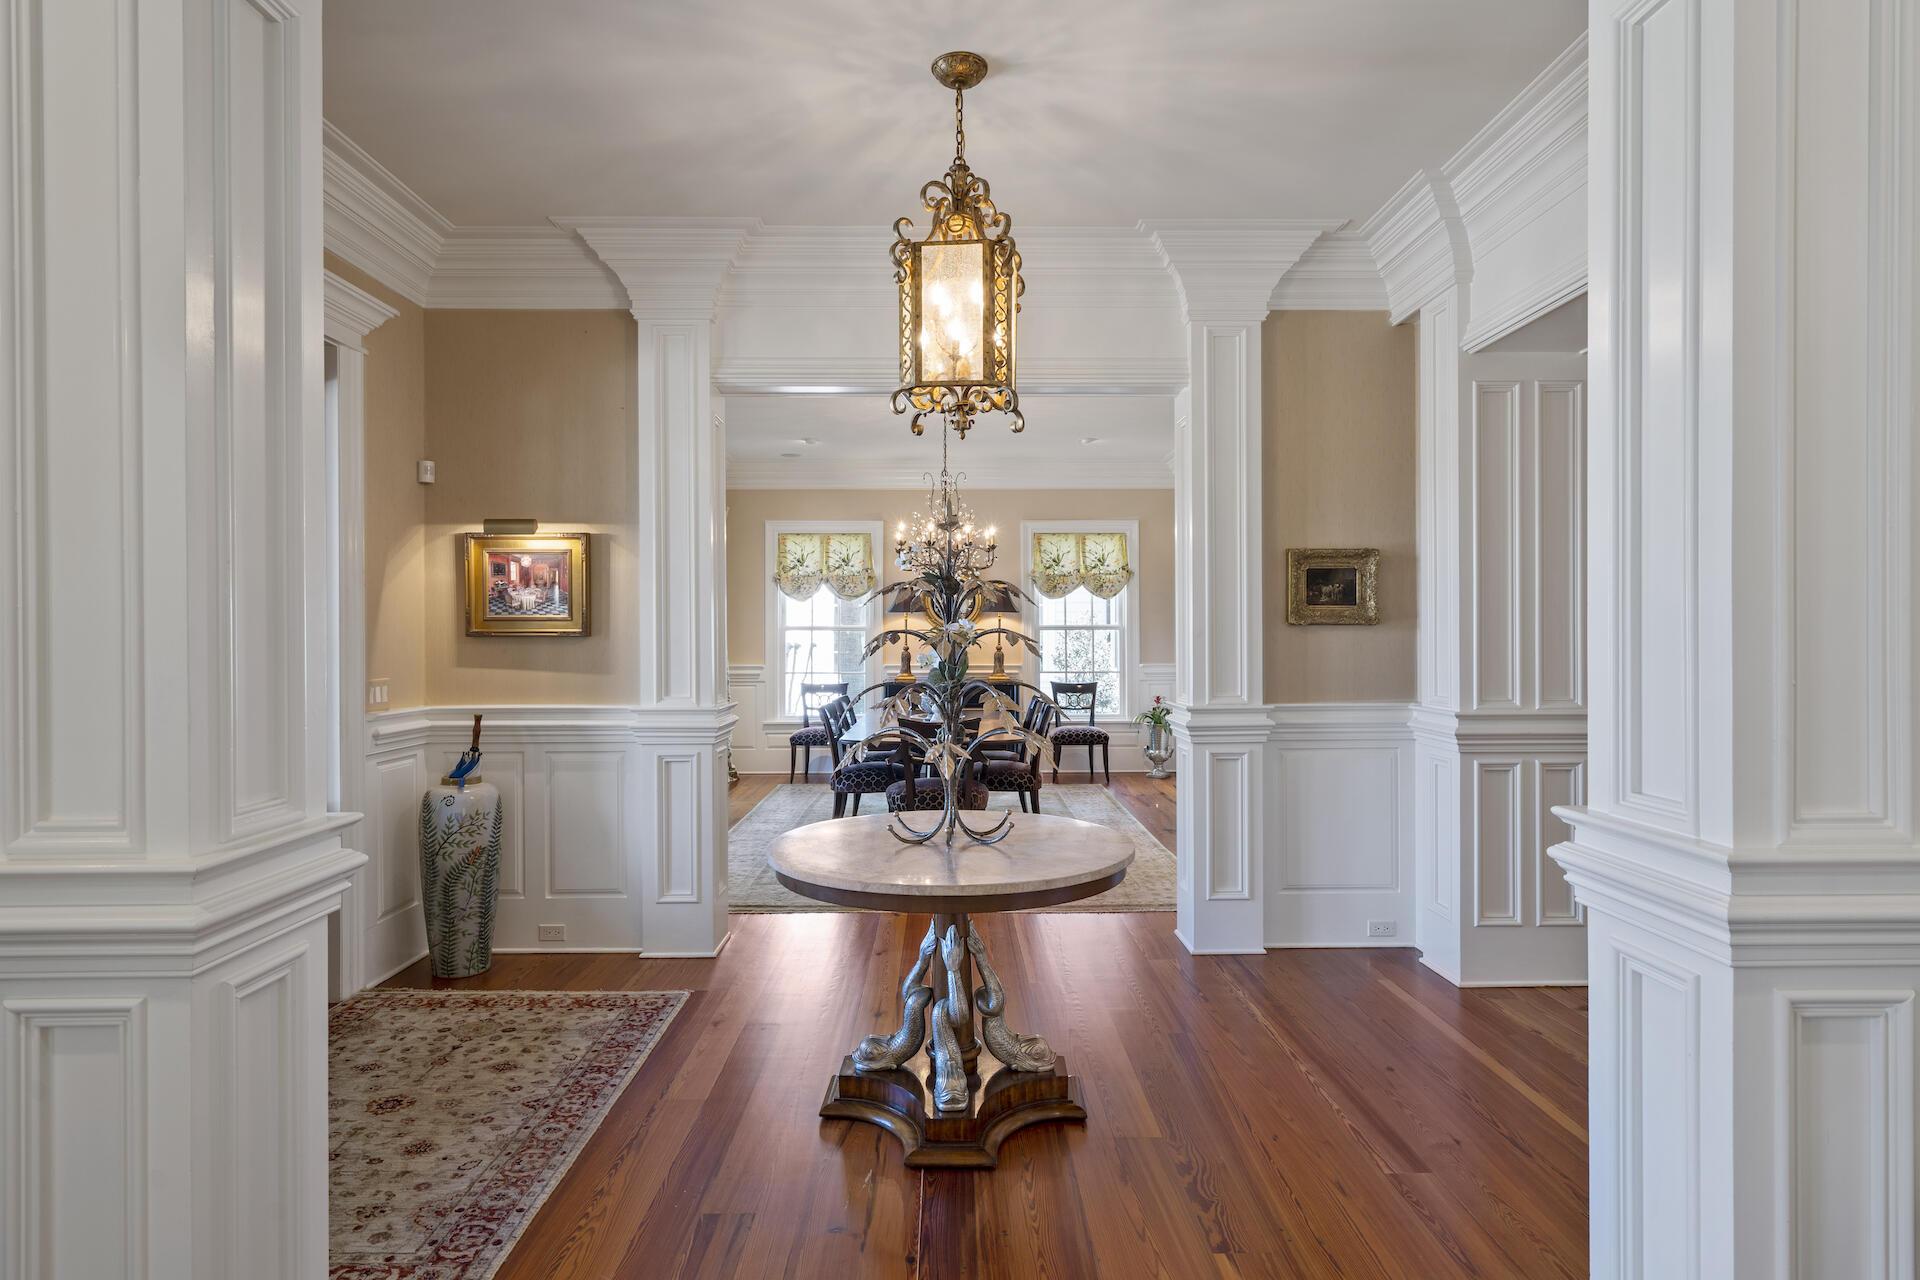 Daniel Island Homes For Sale - 623 Island Park, Charleston, SC - 28